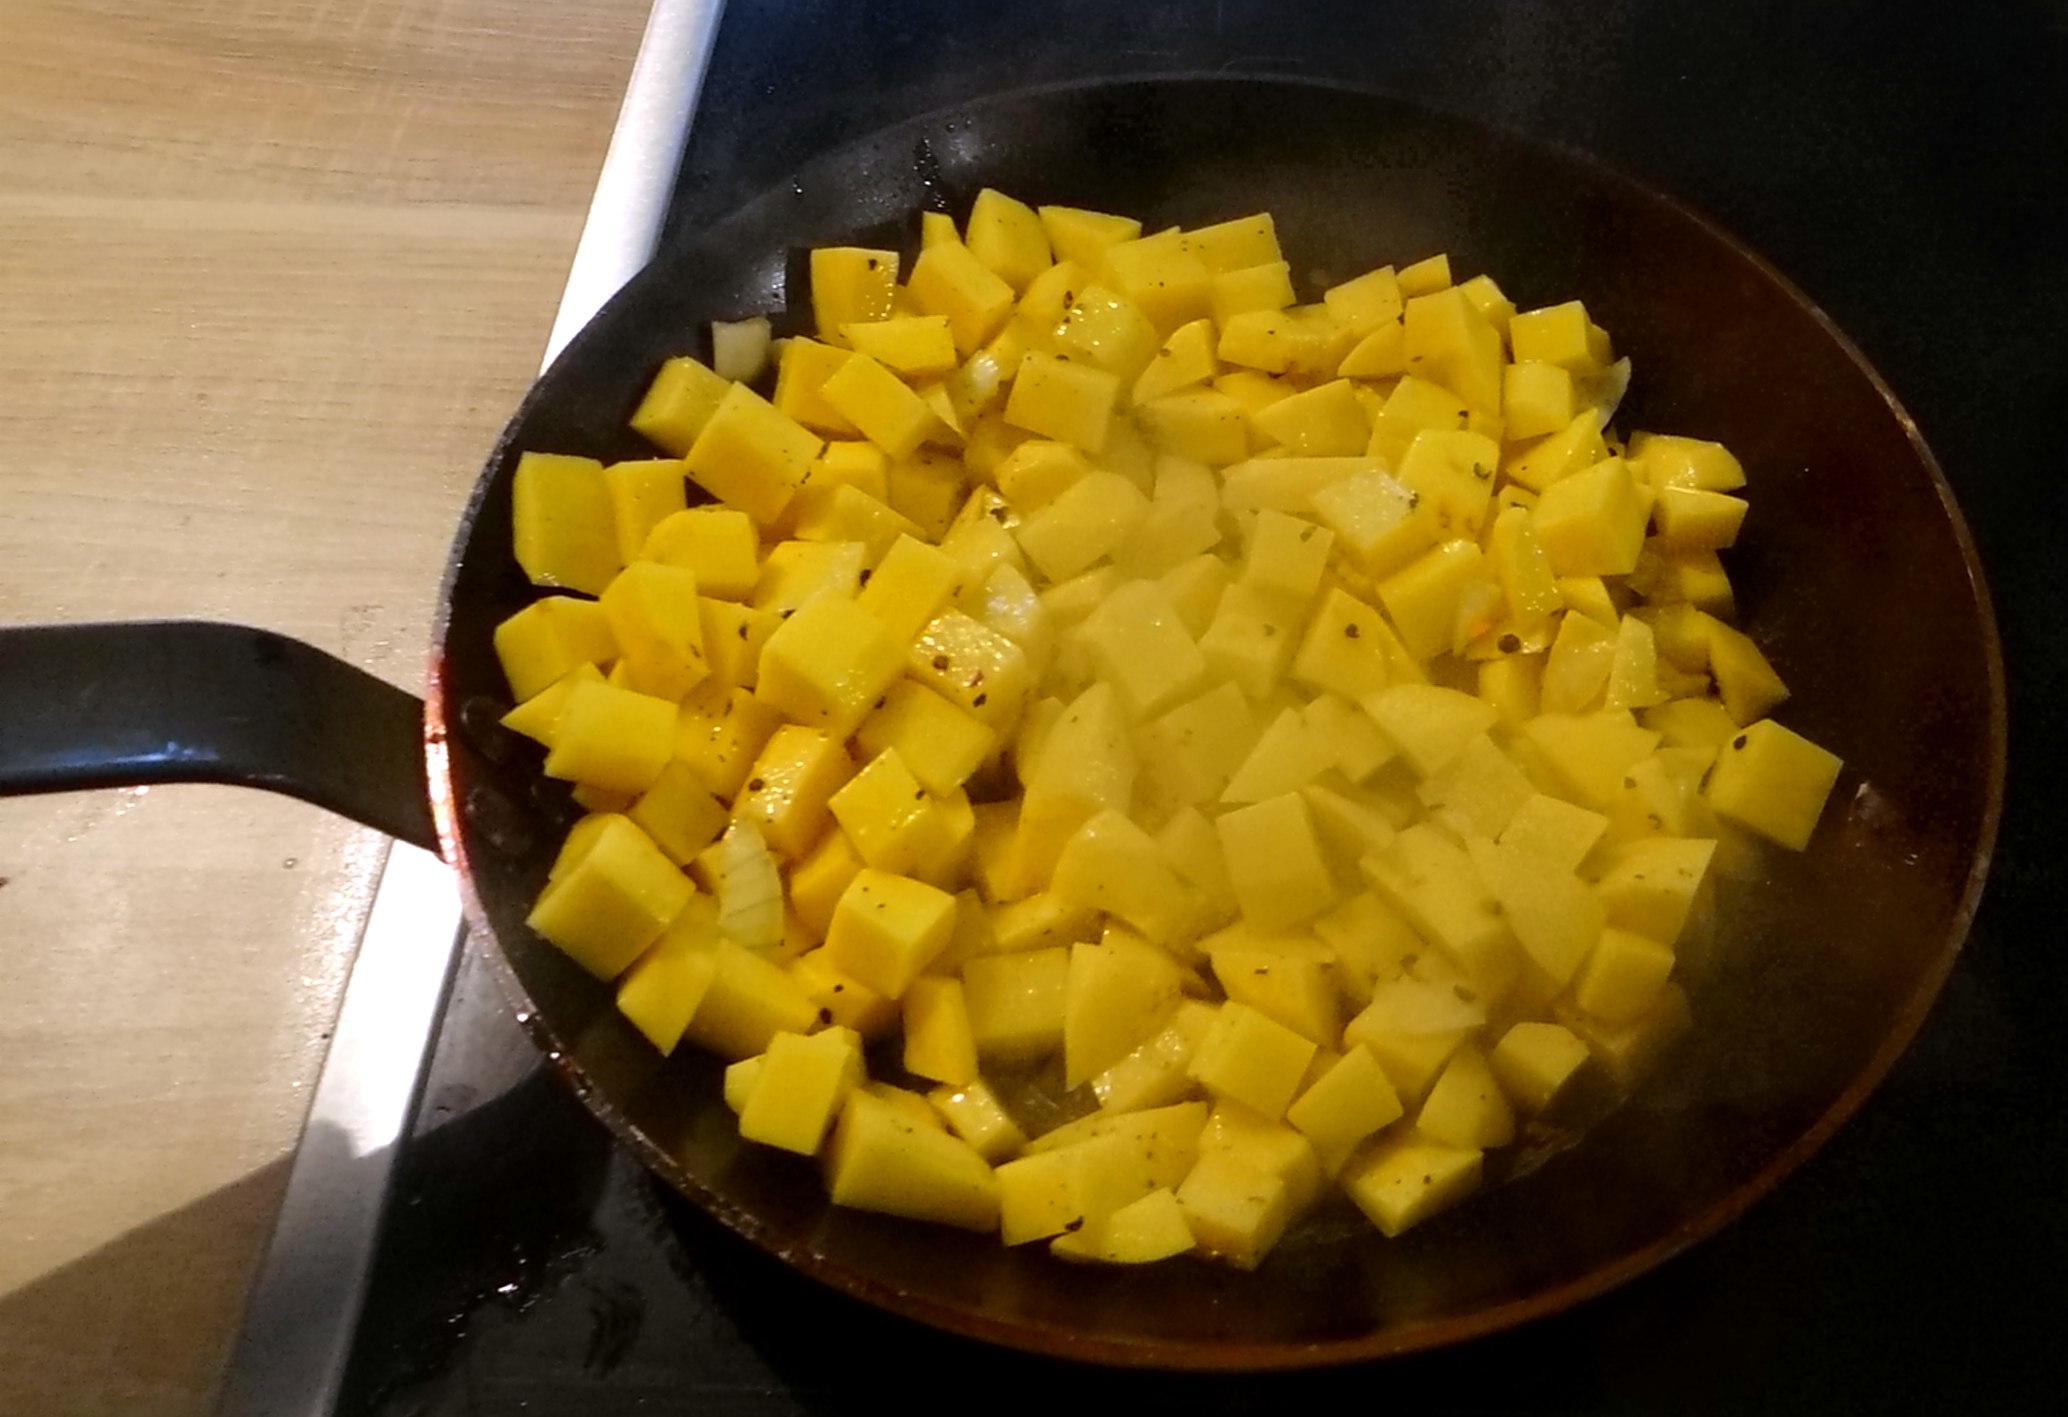 Rohgebratene Kartoffeln,Möhrensalat,Rote Bete Salat (13)